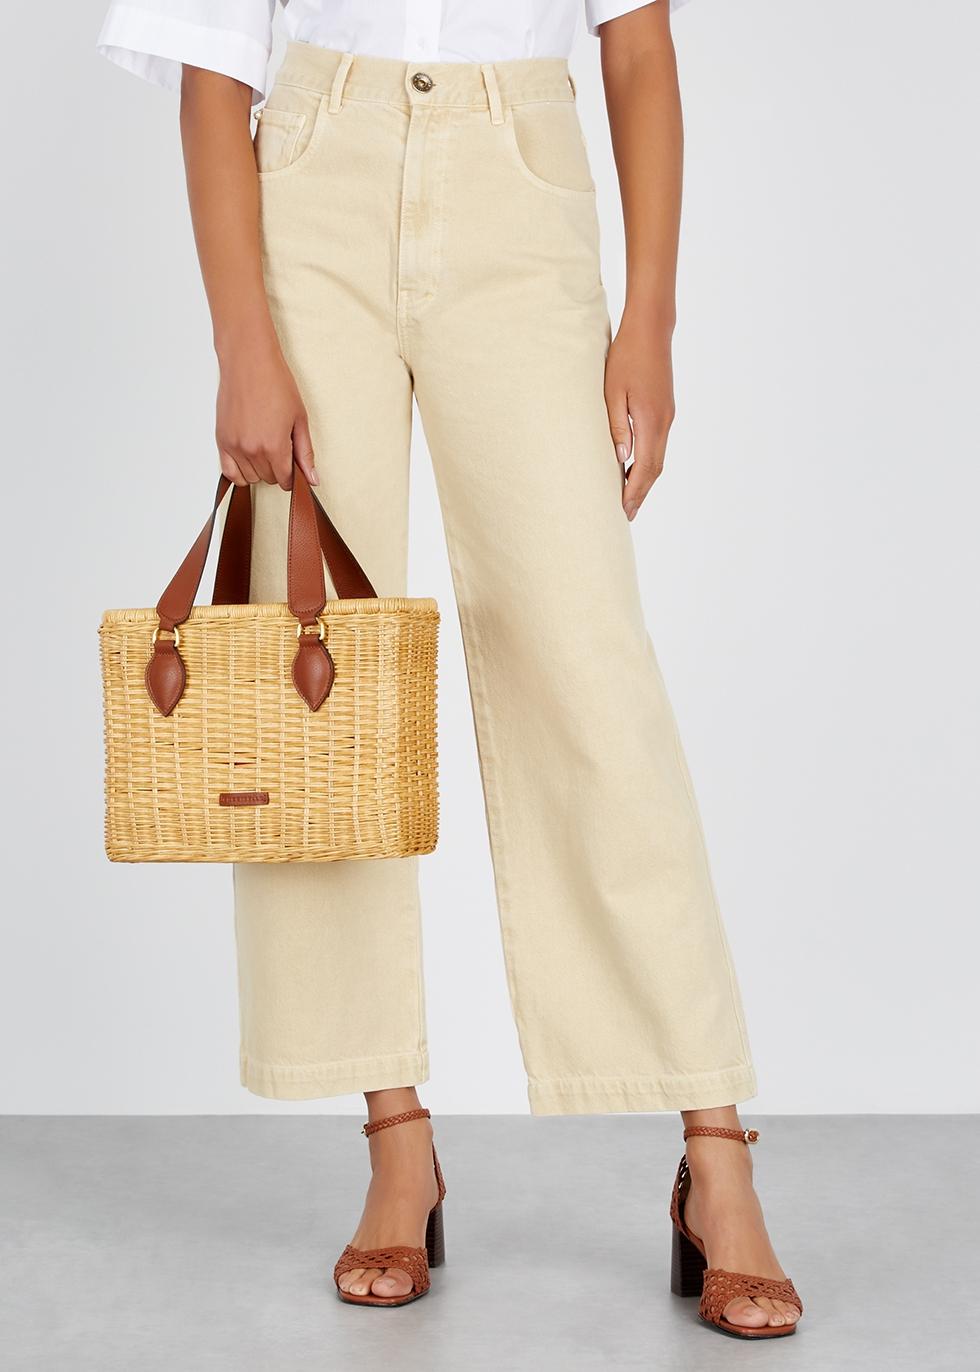 c620eb3a1c Women s Designer Tote Bags - Leather   Canvas - Harvey Nichols